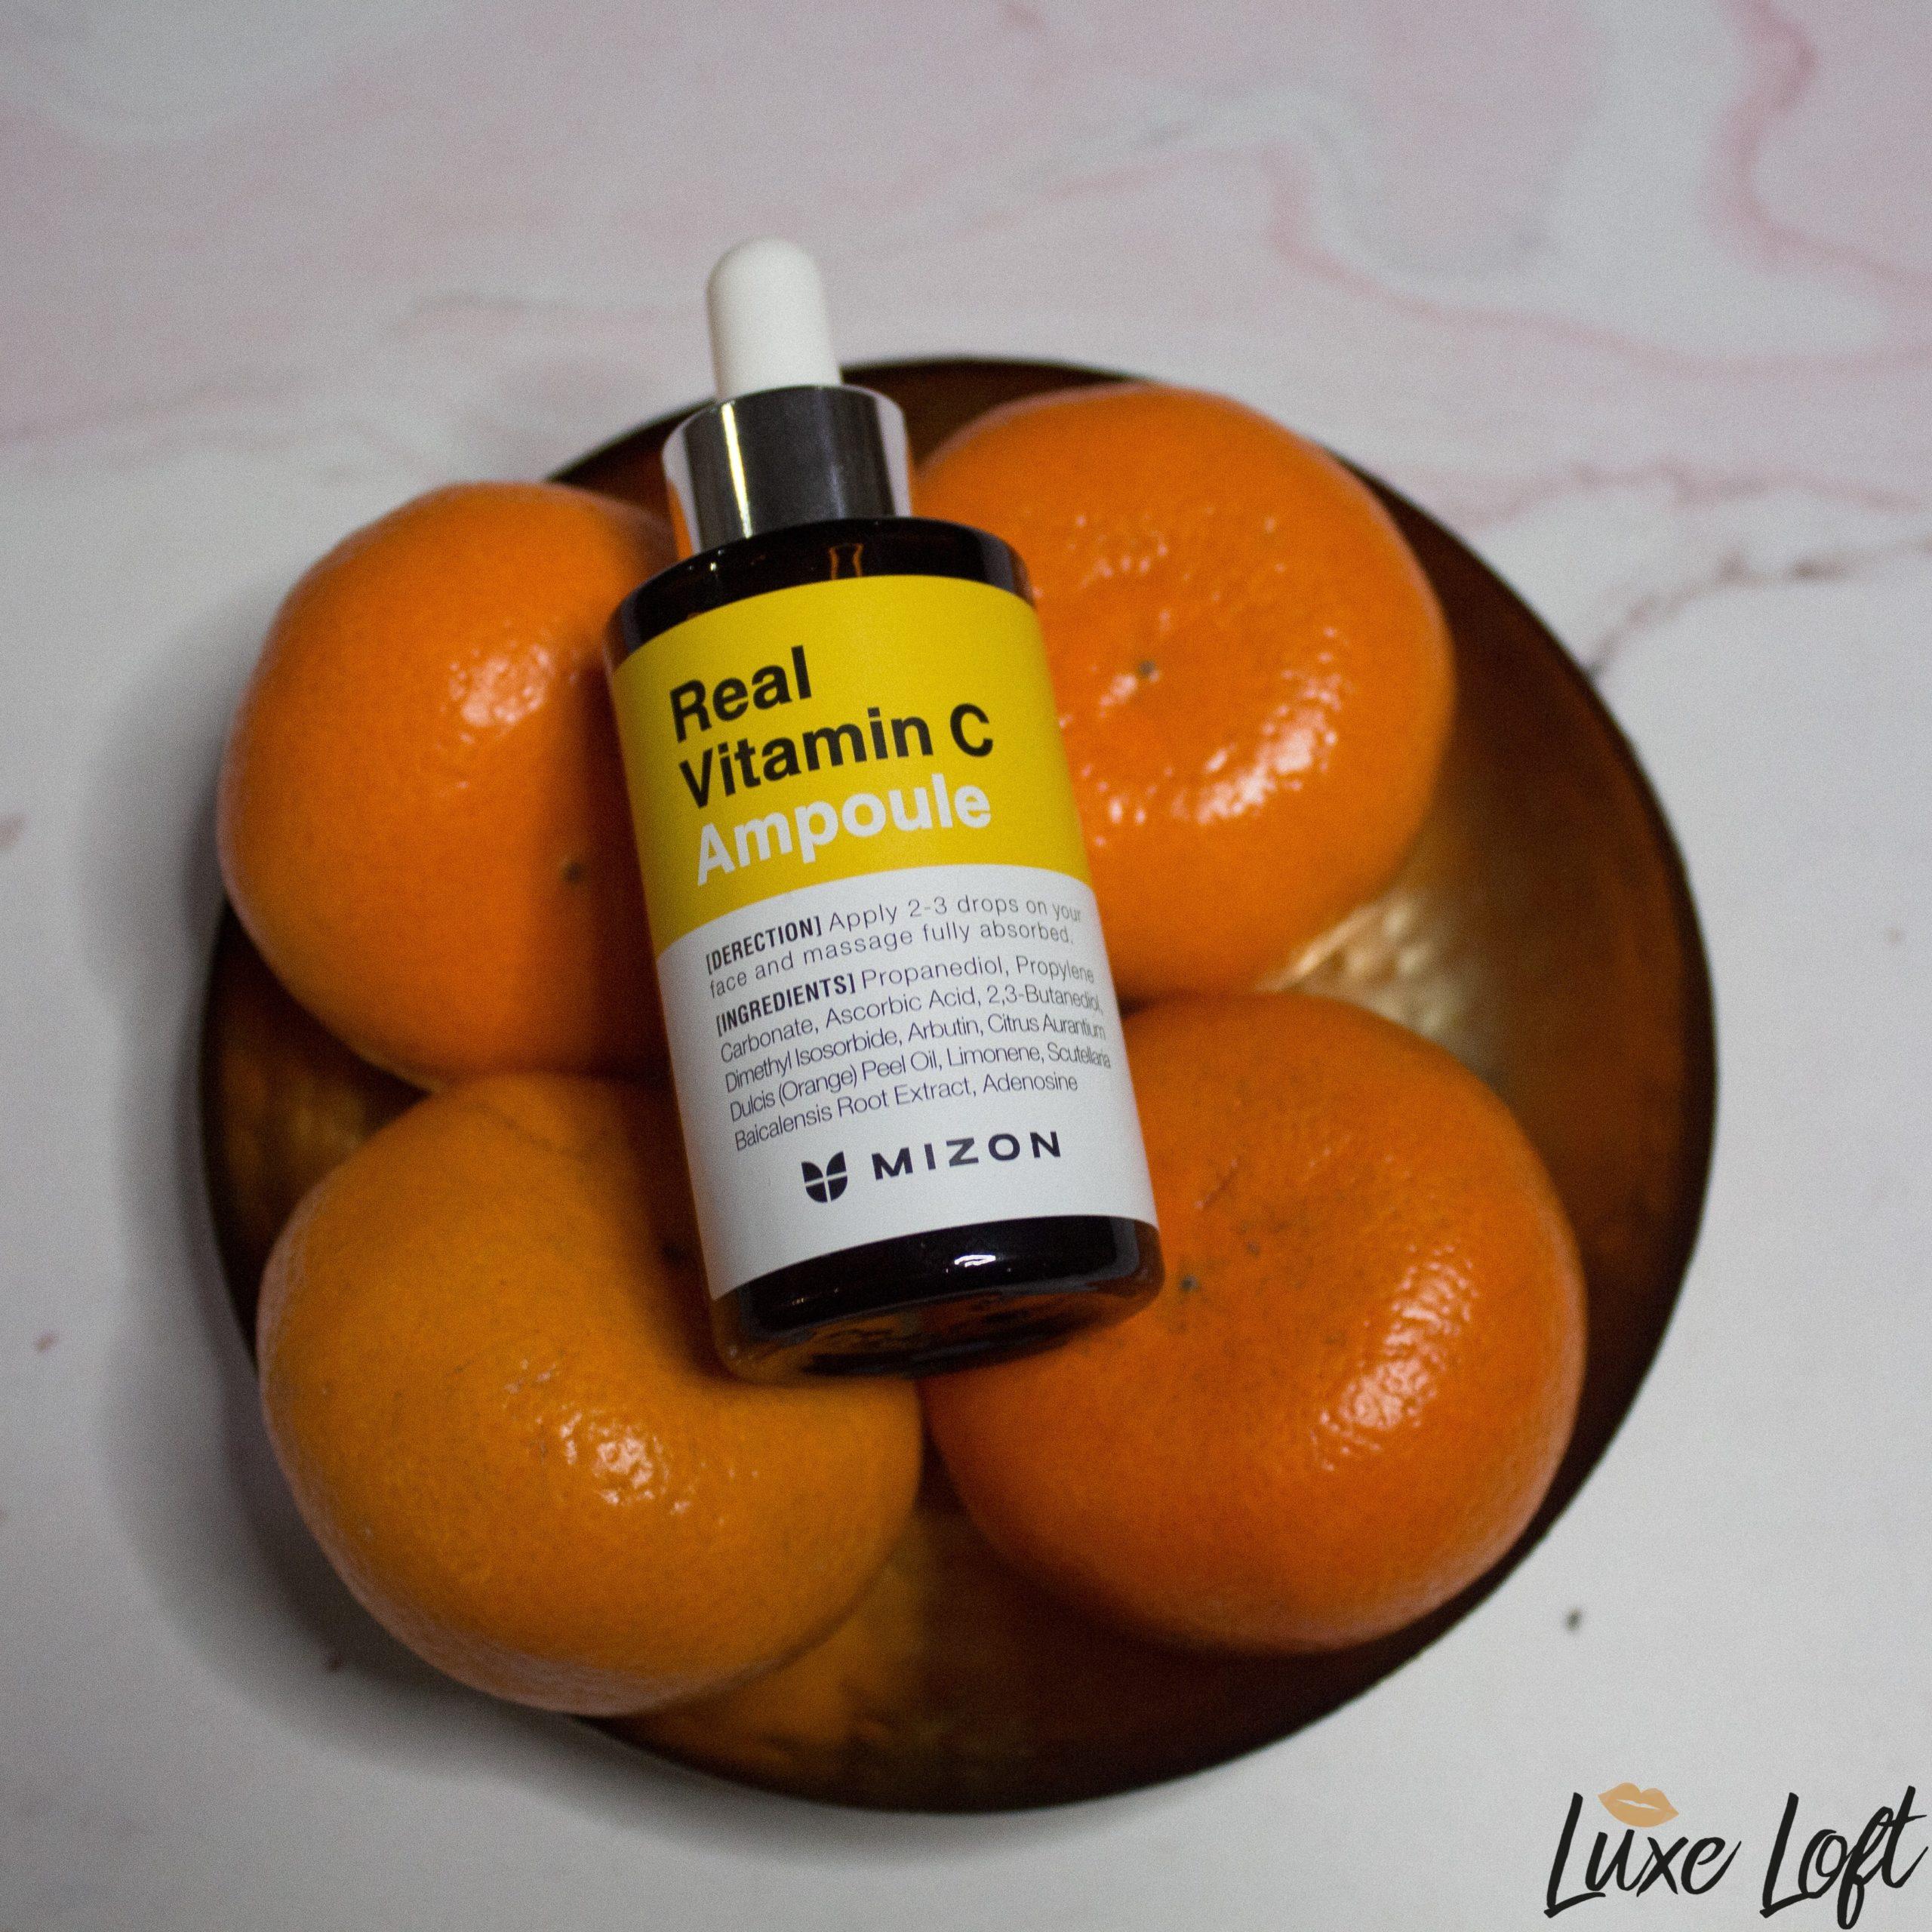 Mizon Vitamin C Ampoule